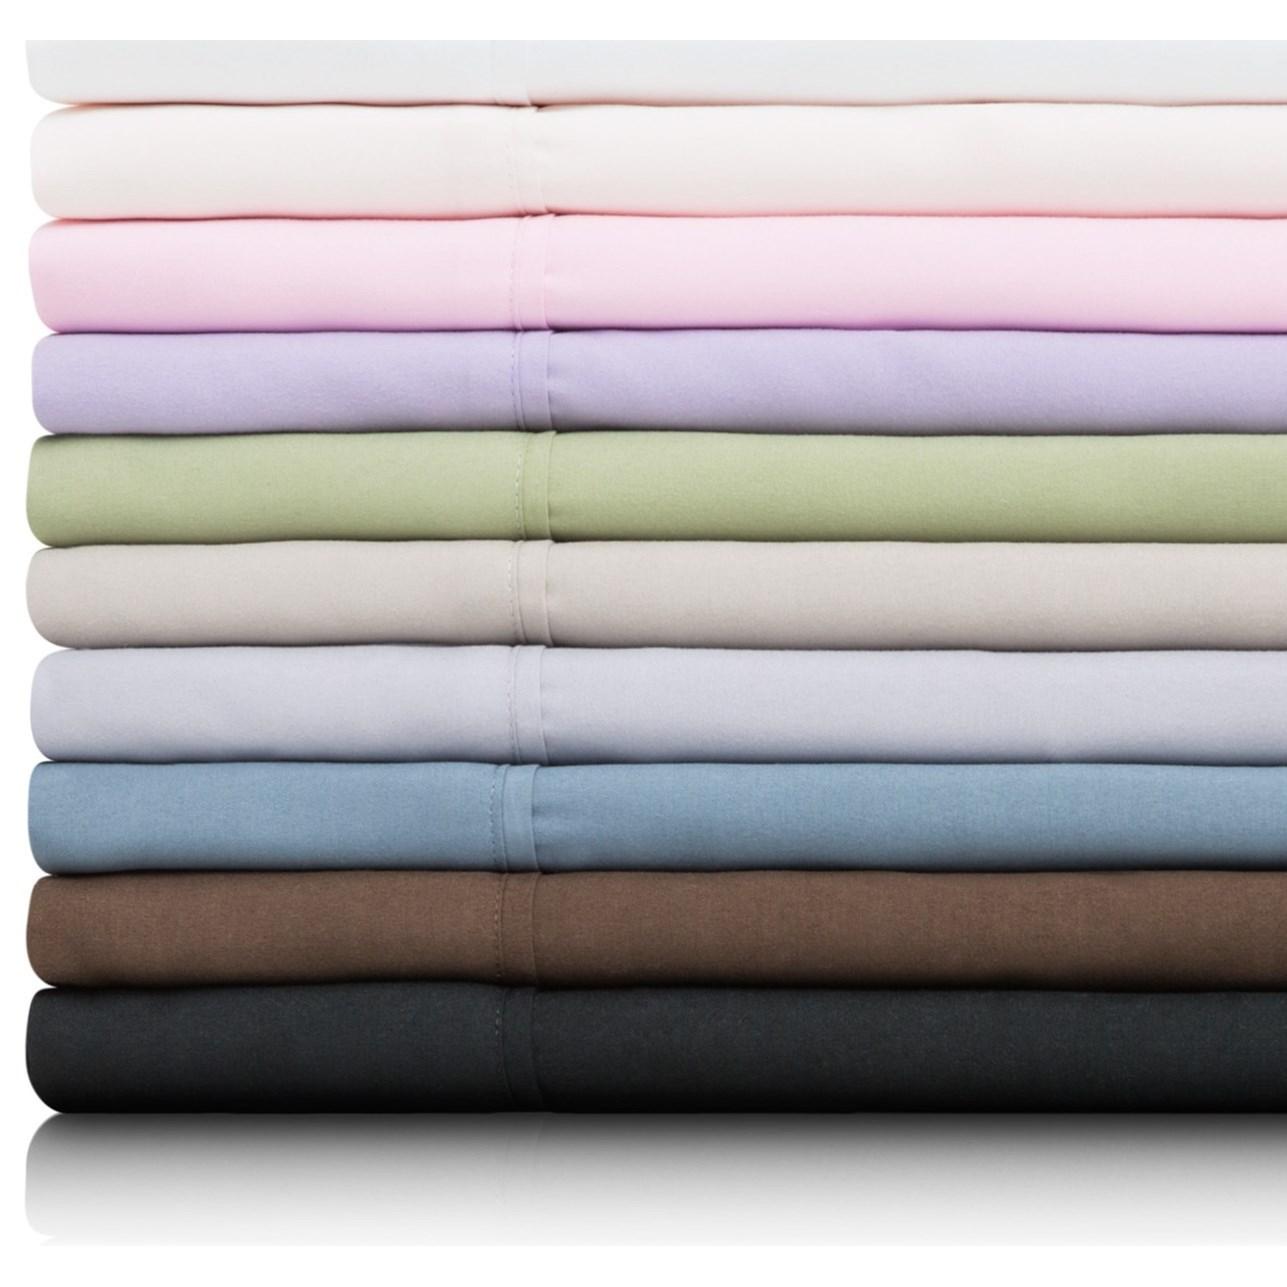 Malouf Brushed Microfiber King Woven™ Brushed Microfiber Pillowcases  - Item Number: MA90KKFEPC